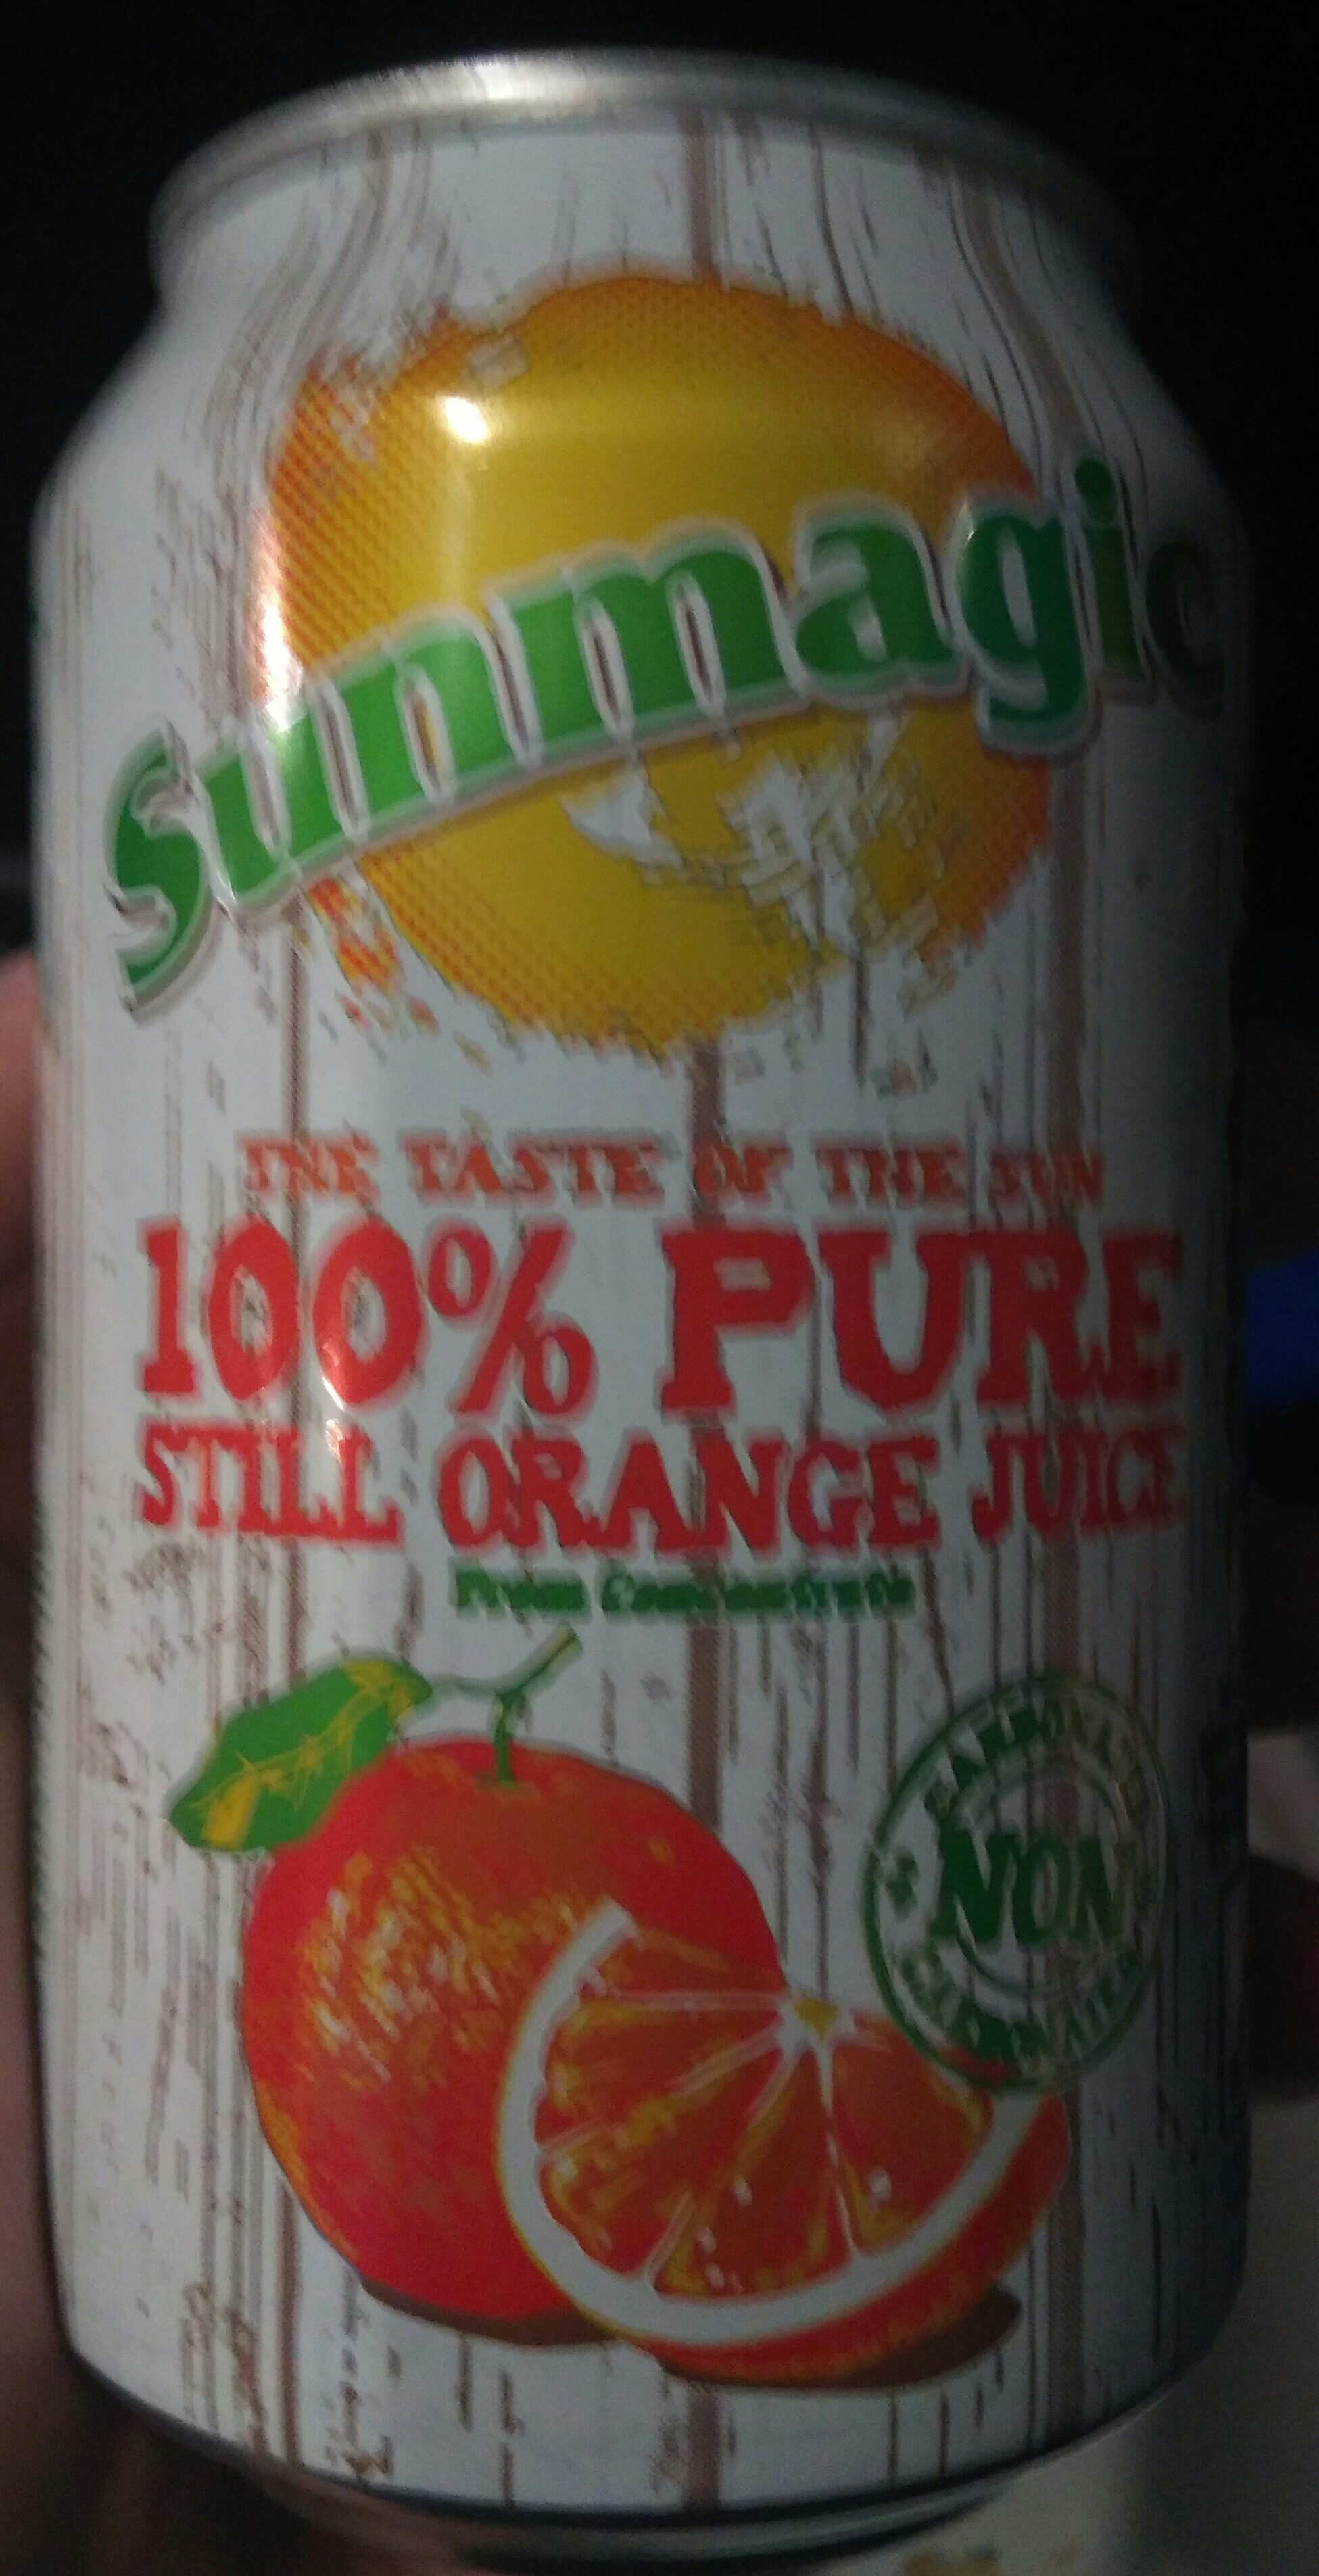 Sunmagic Pure Orange Juice (cans) - Product